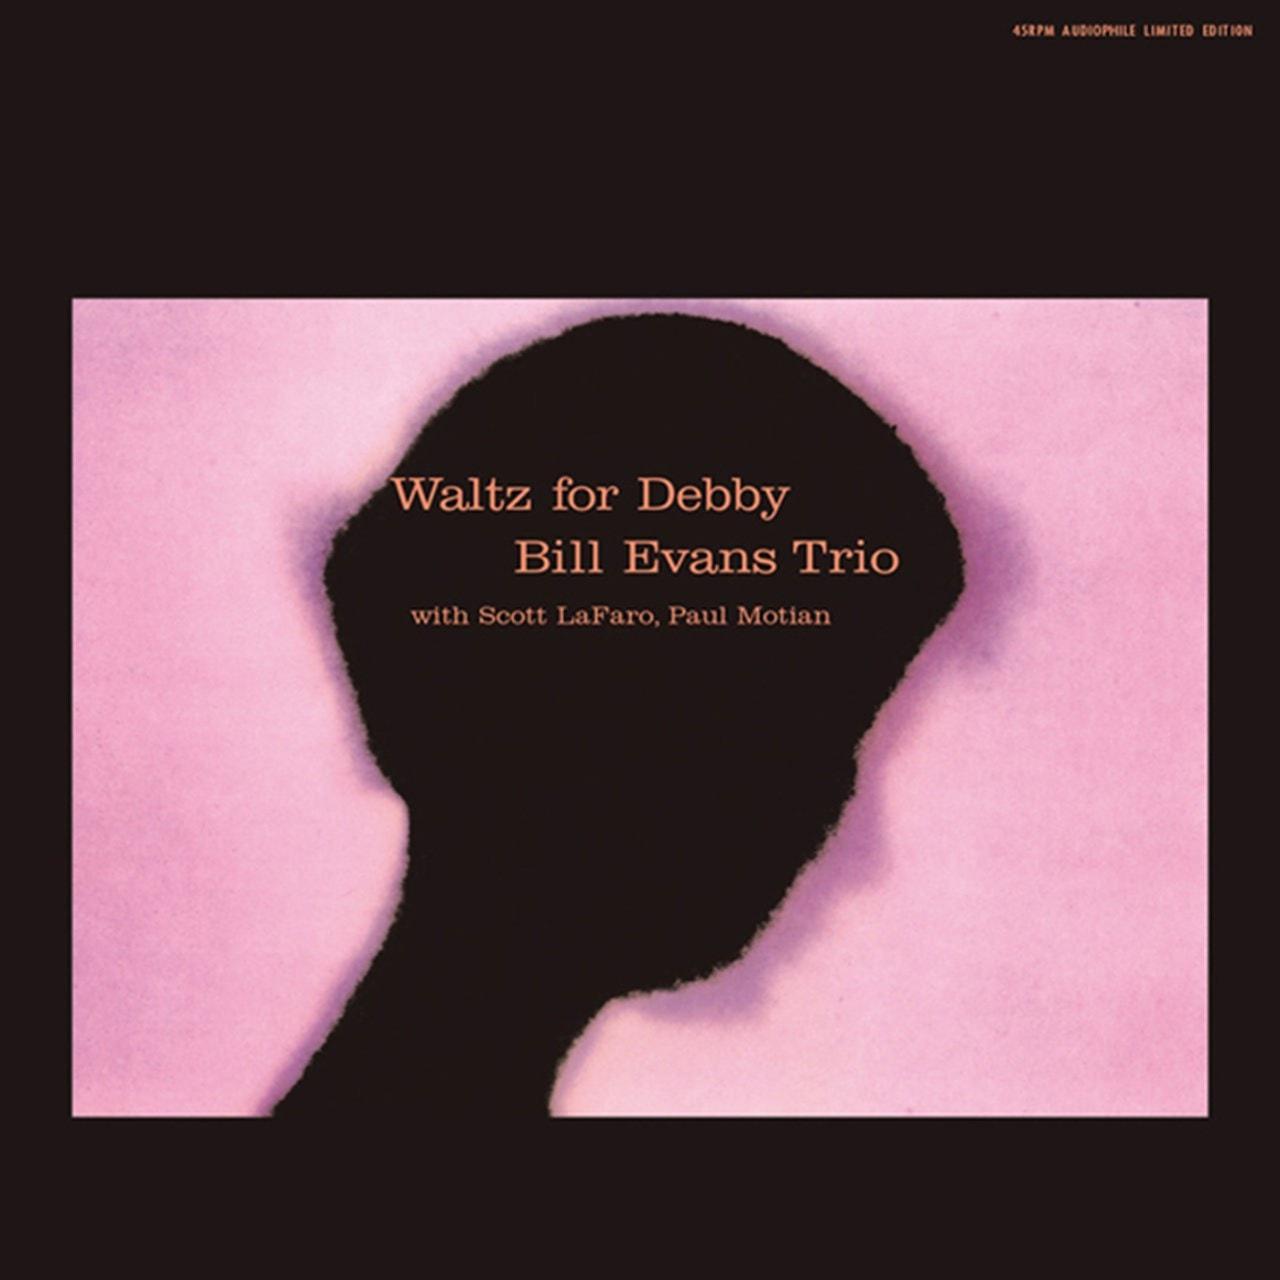 Waltz for Debby - 1